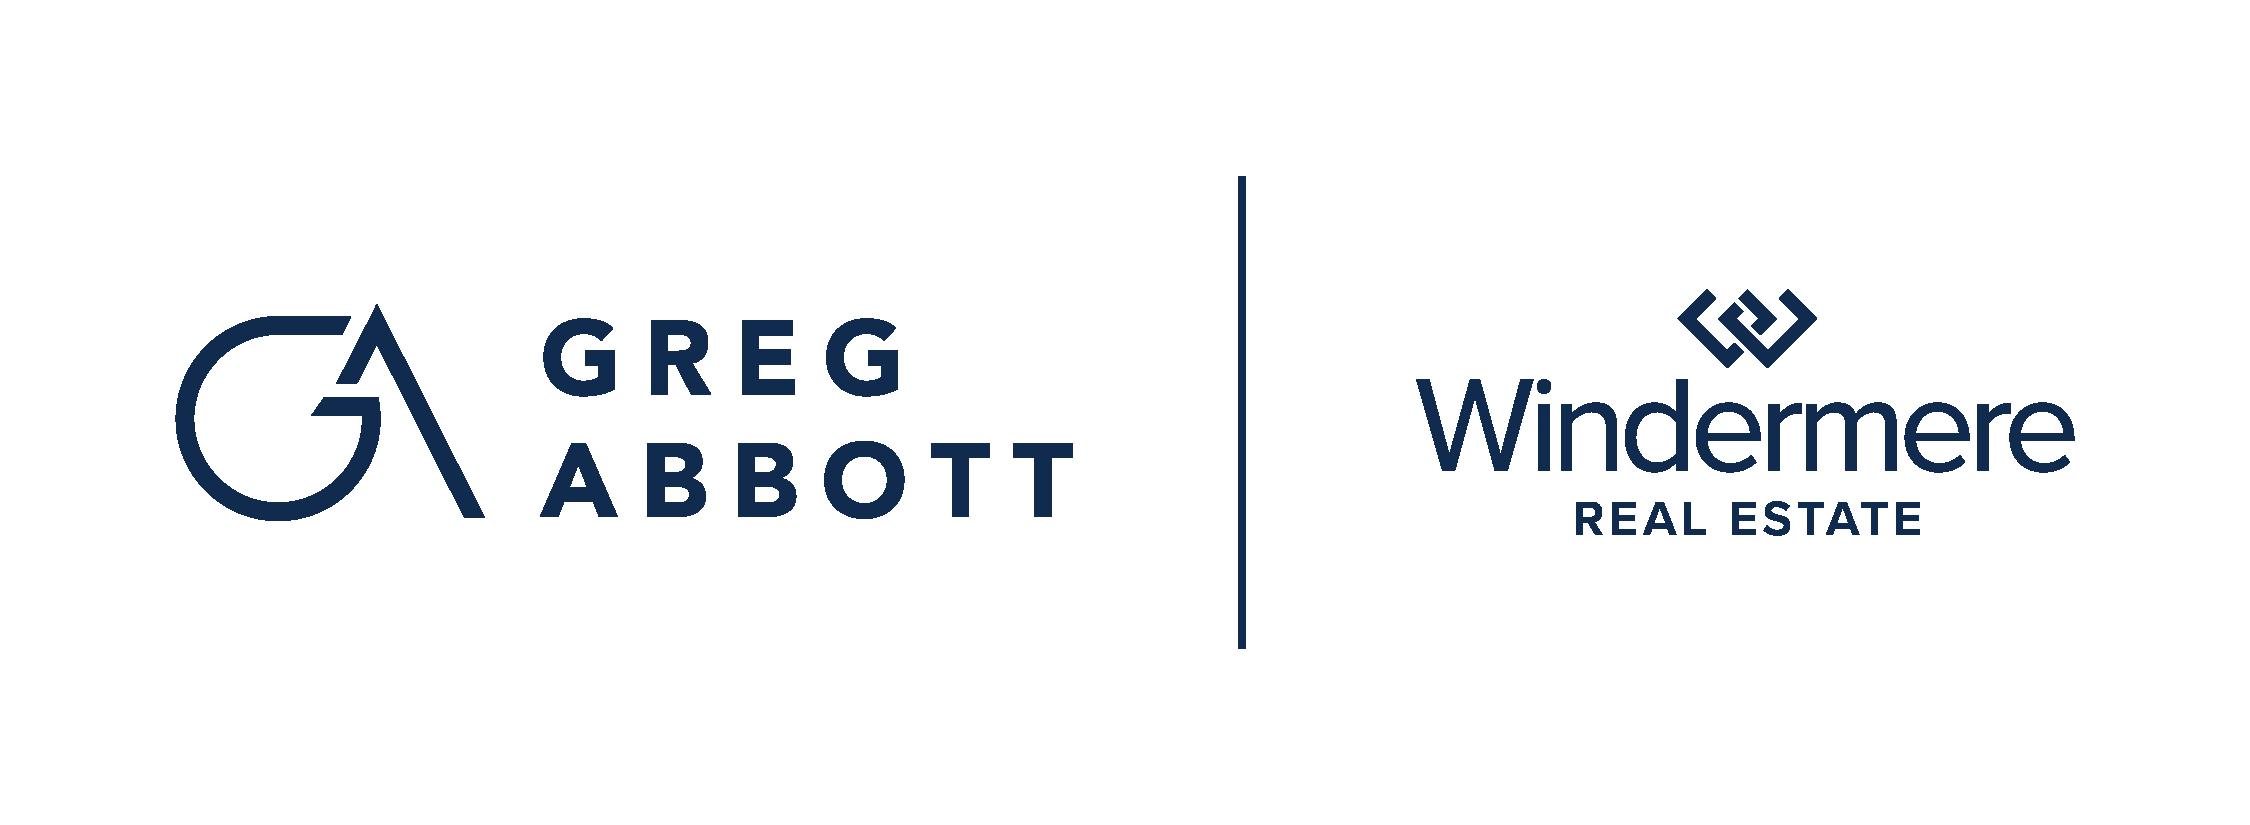 GregAbbott_Homepage_Logos